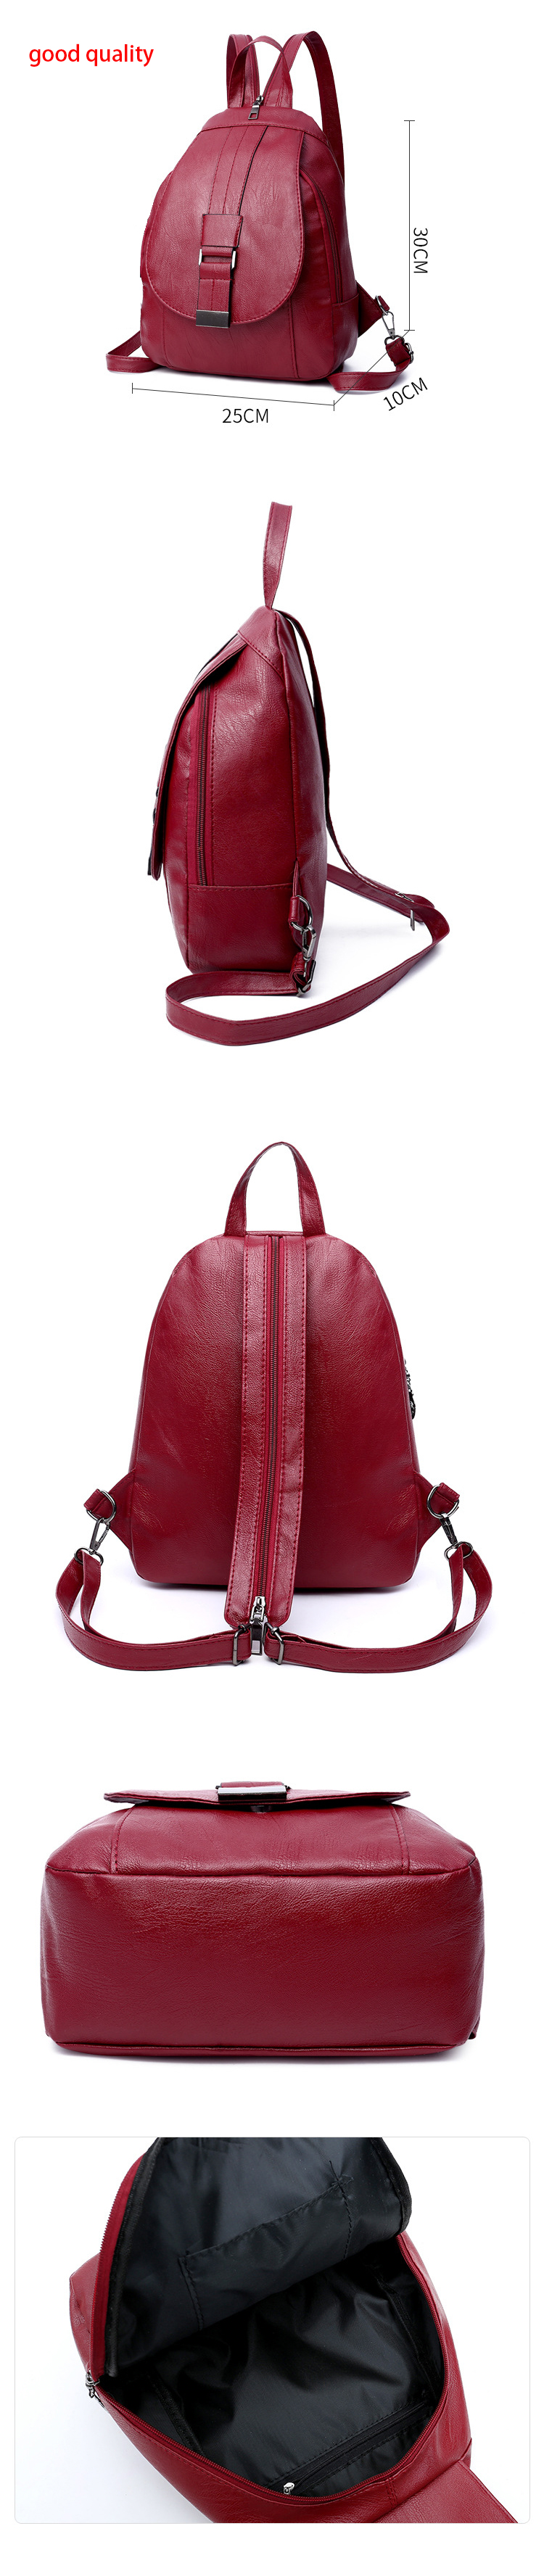 Women's Vintage Leather Backpack 22